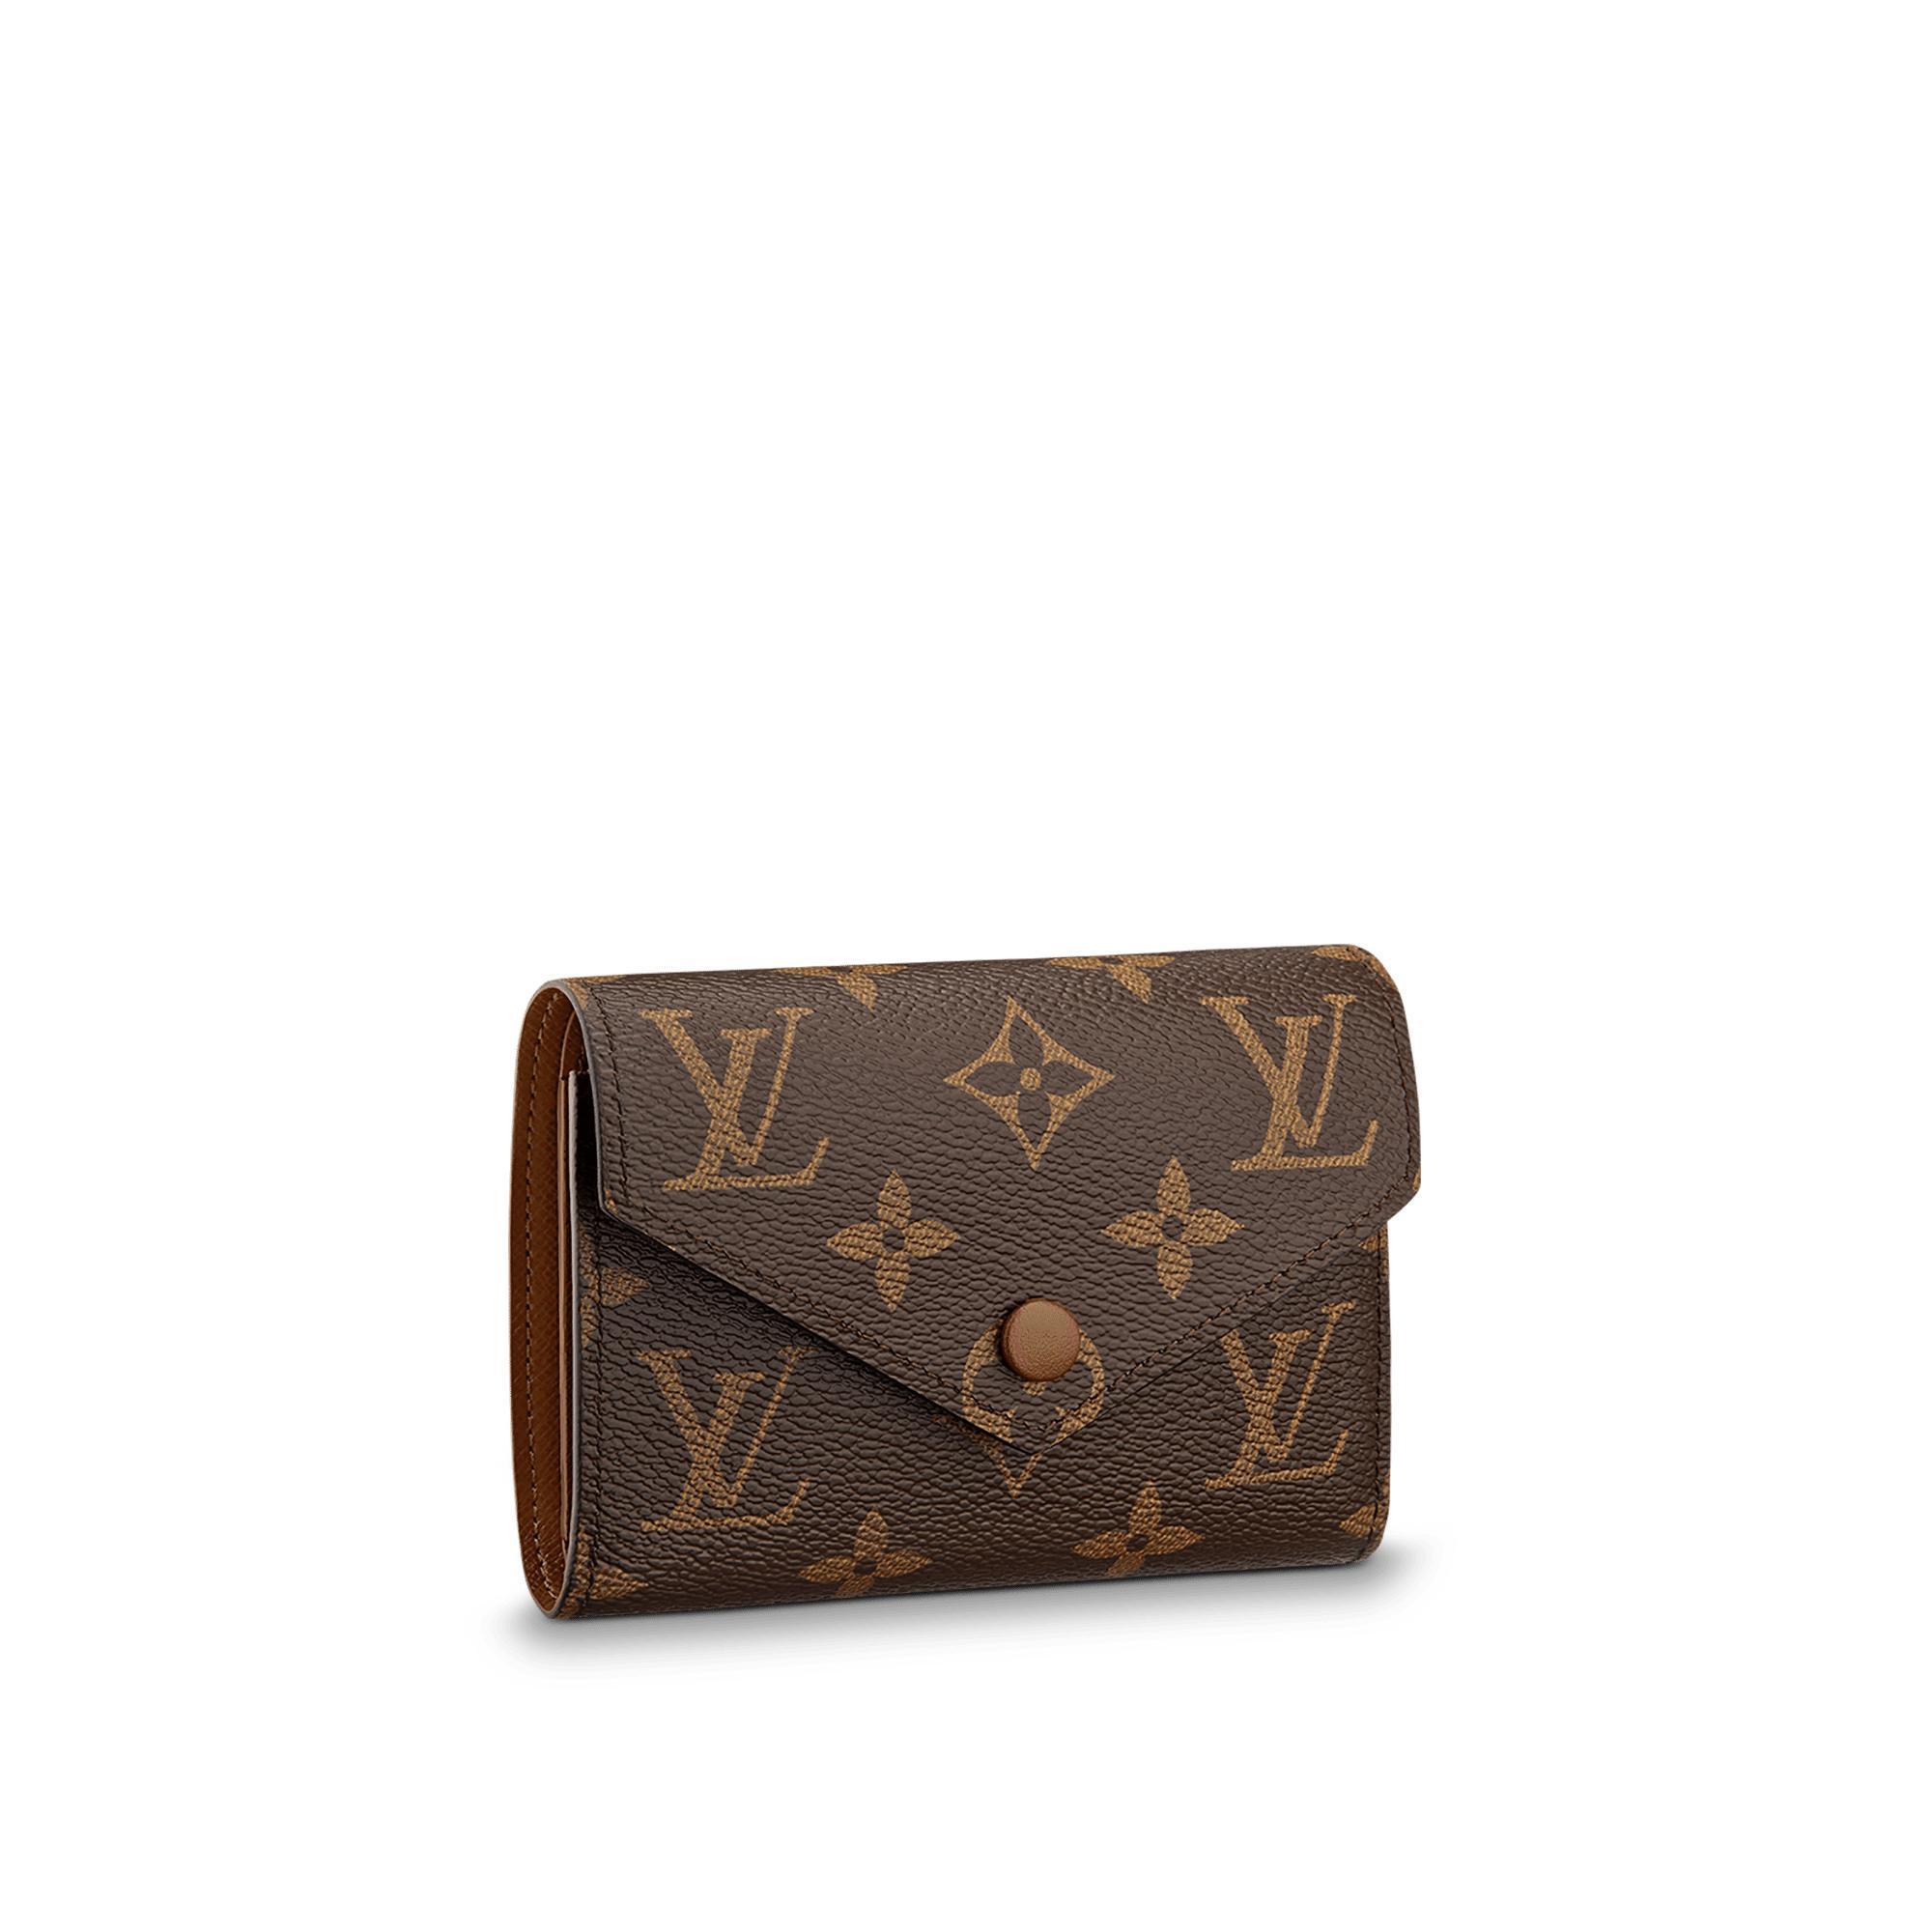 Victorine Wallet in Monogram